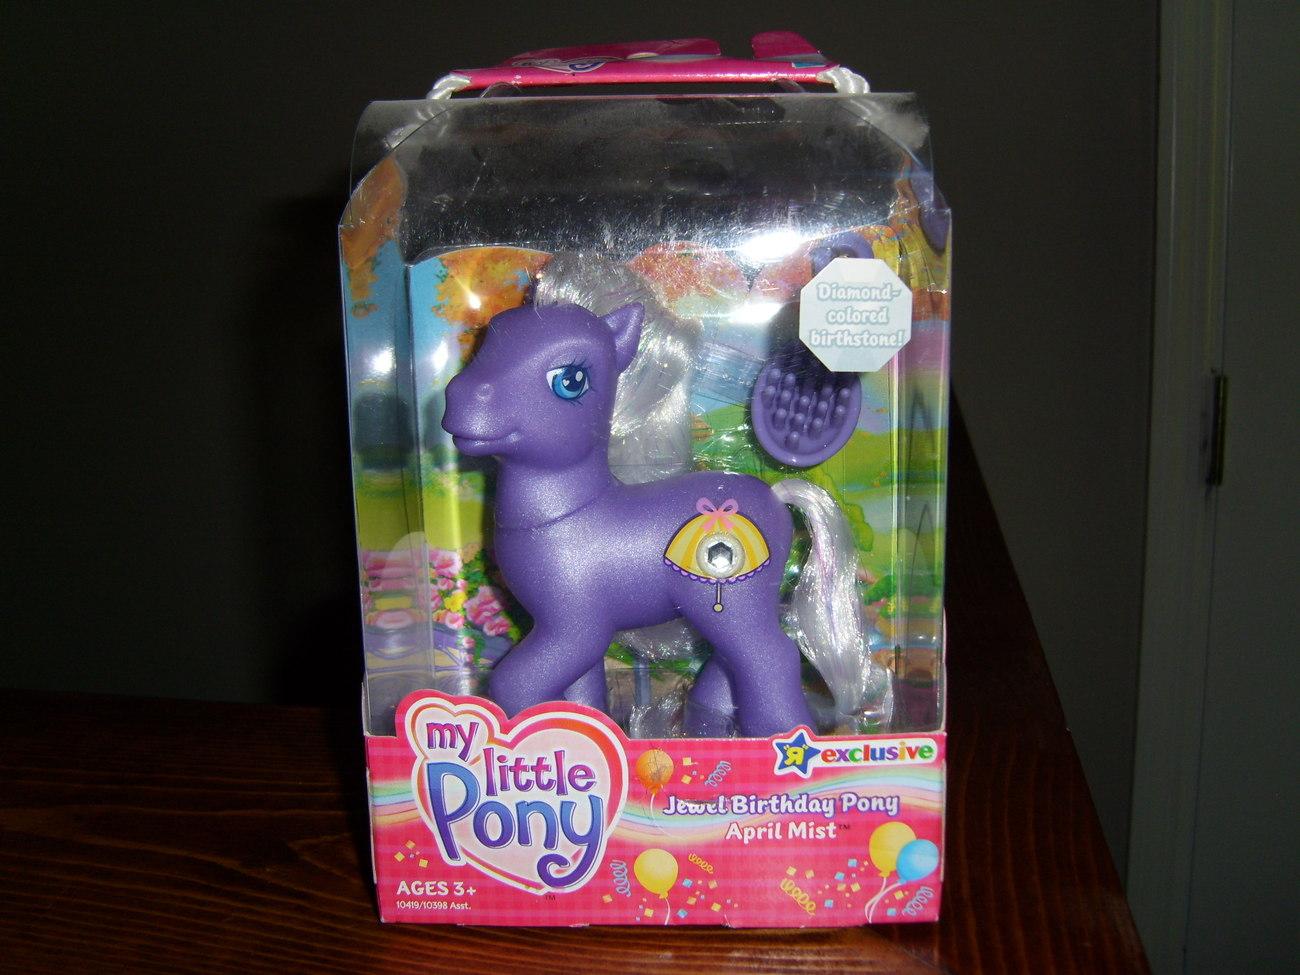 My little pony mib april mist